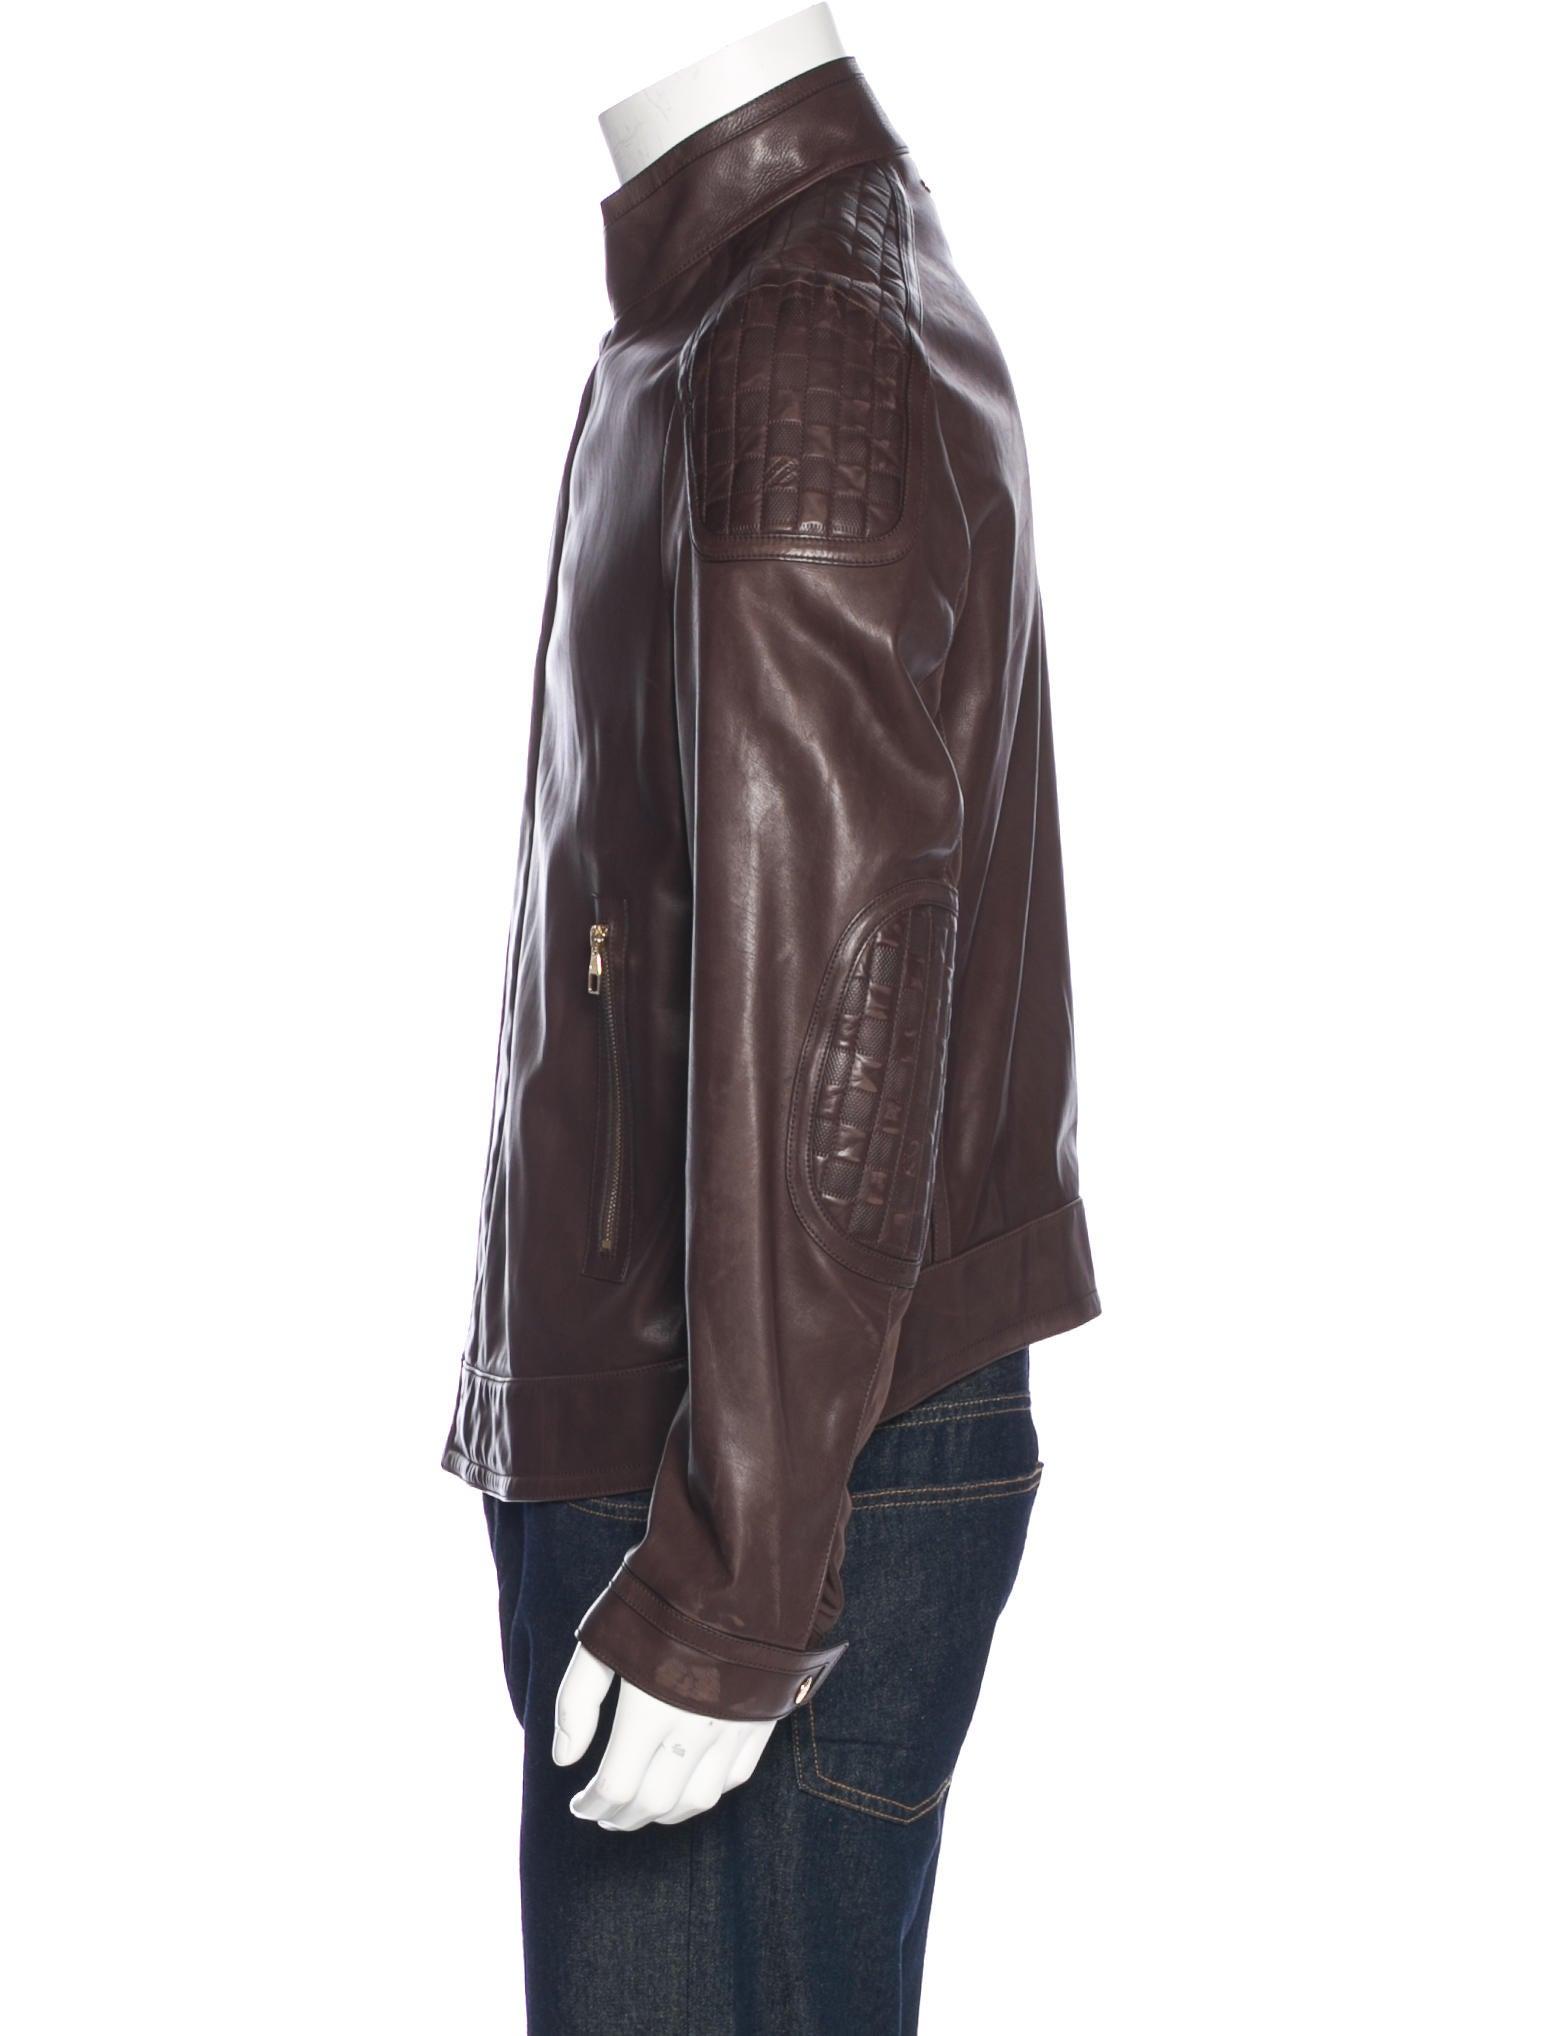 louis vuitton damier paneled moto jacket clothing. Black Bedroom Furniture Sets. Home Design Ideas